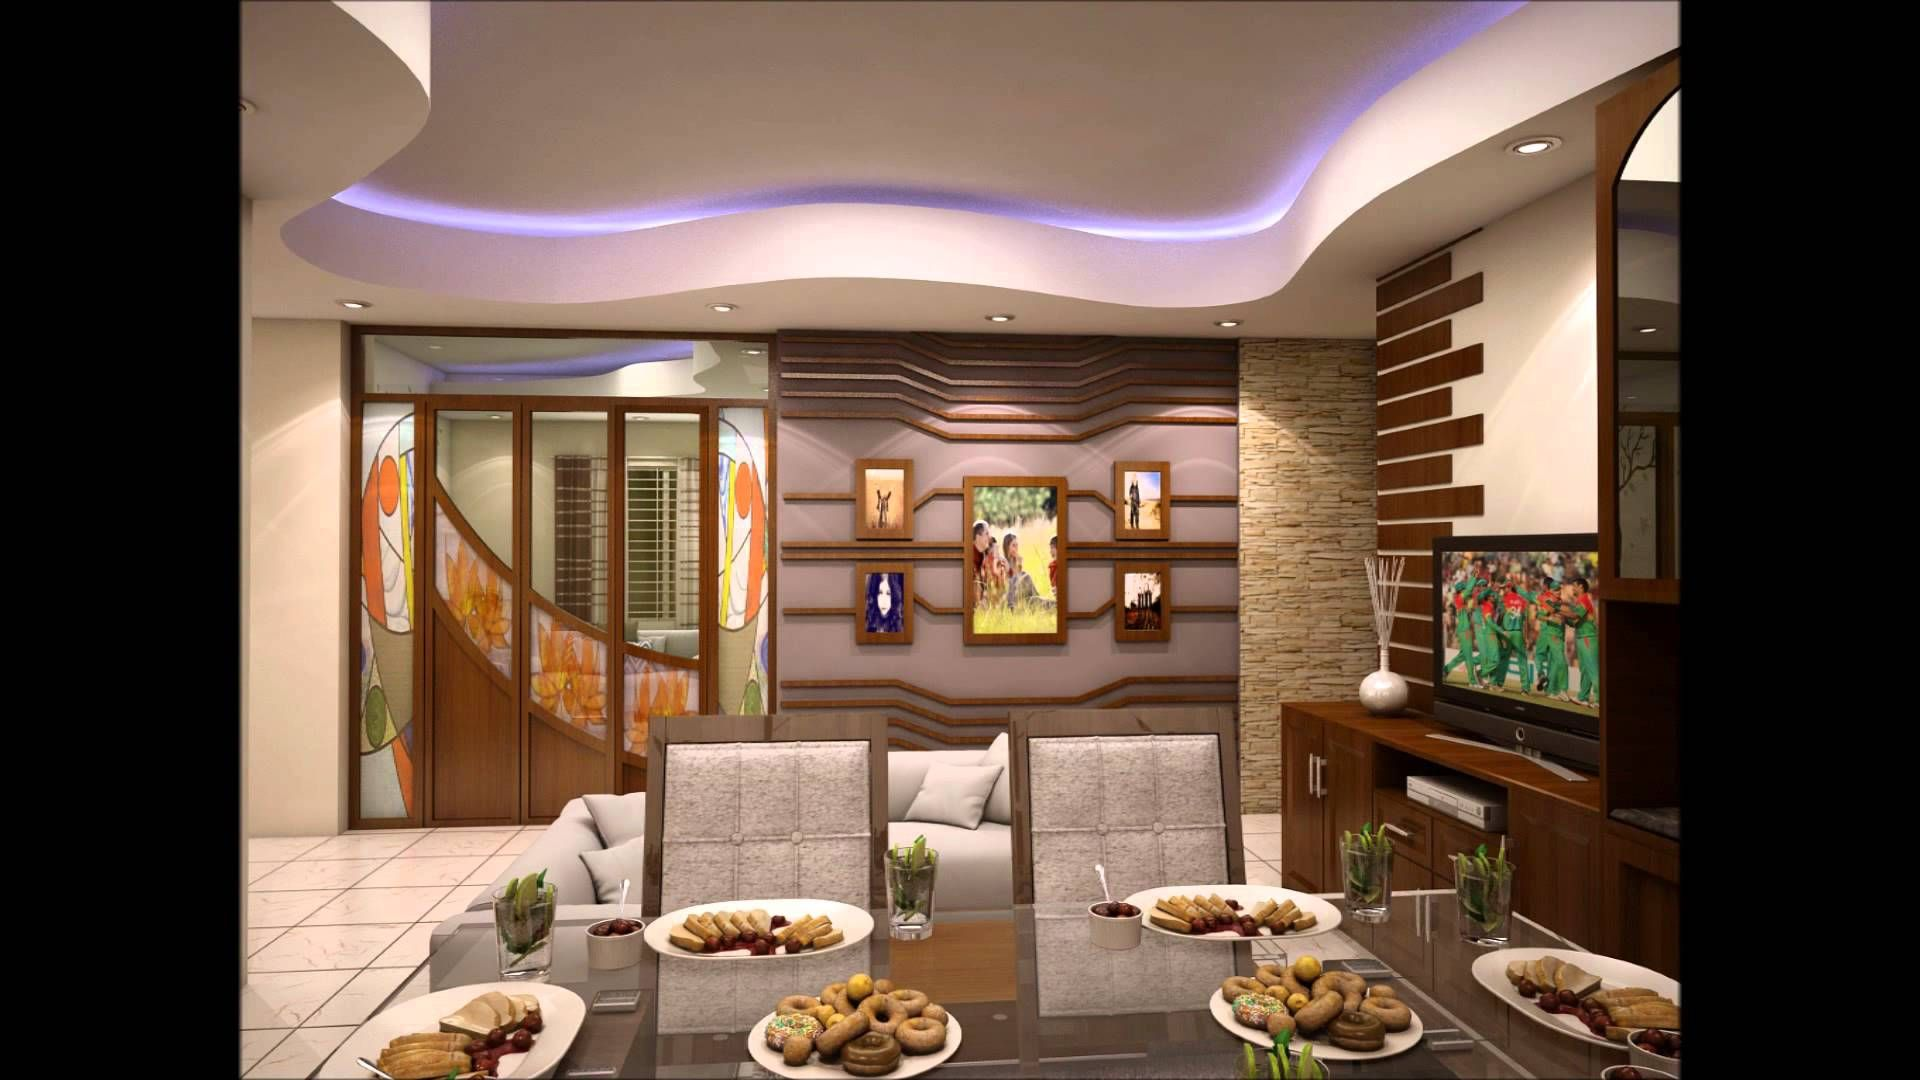 Top Interior Design Company In Bangladesh Best Interior Design